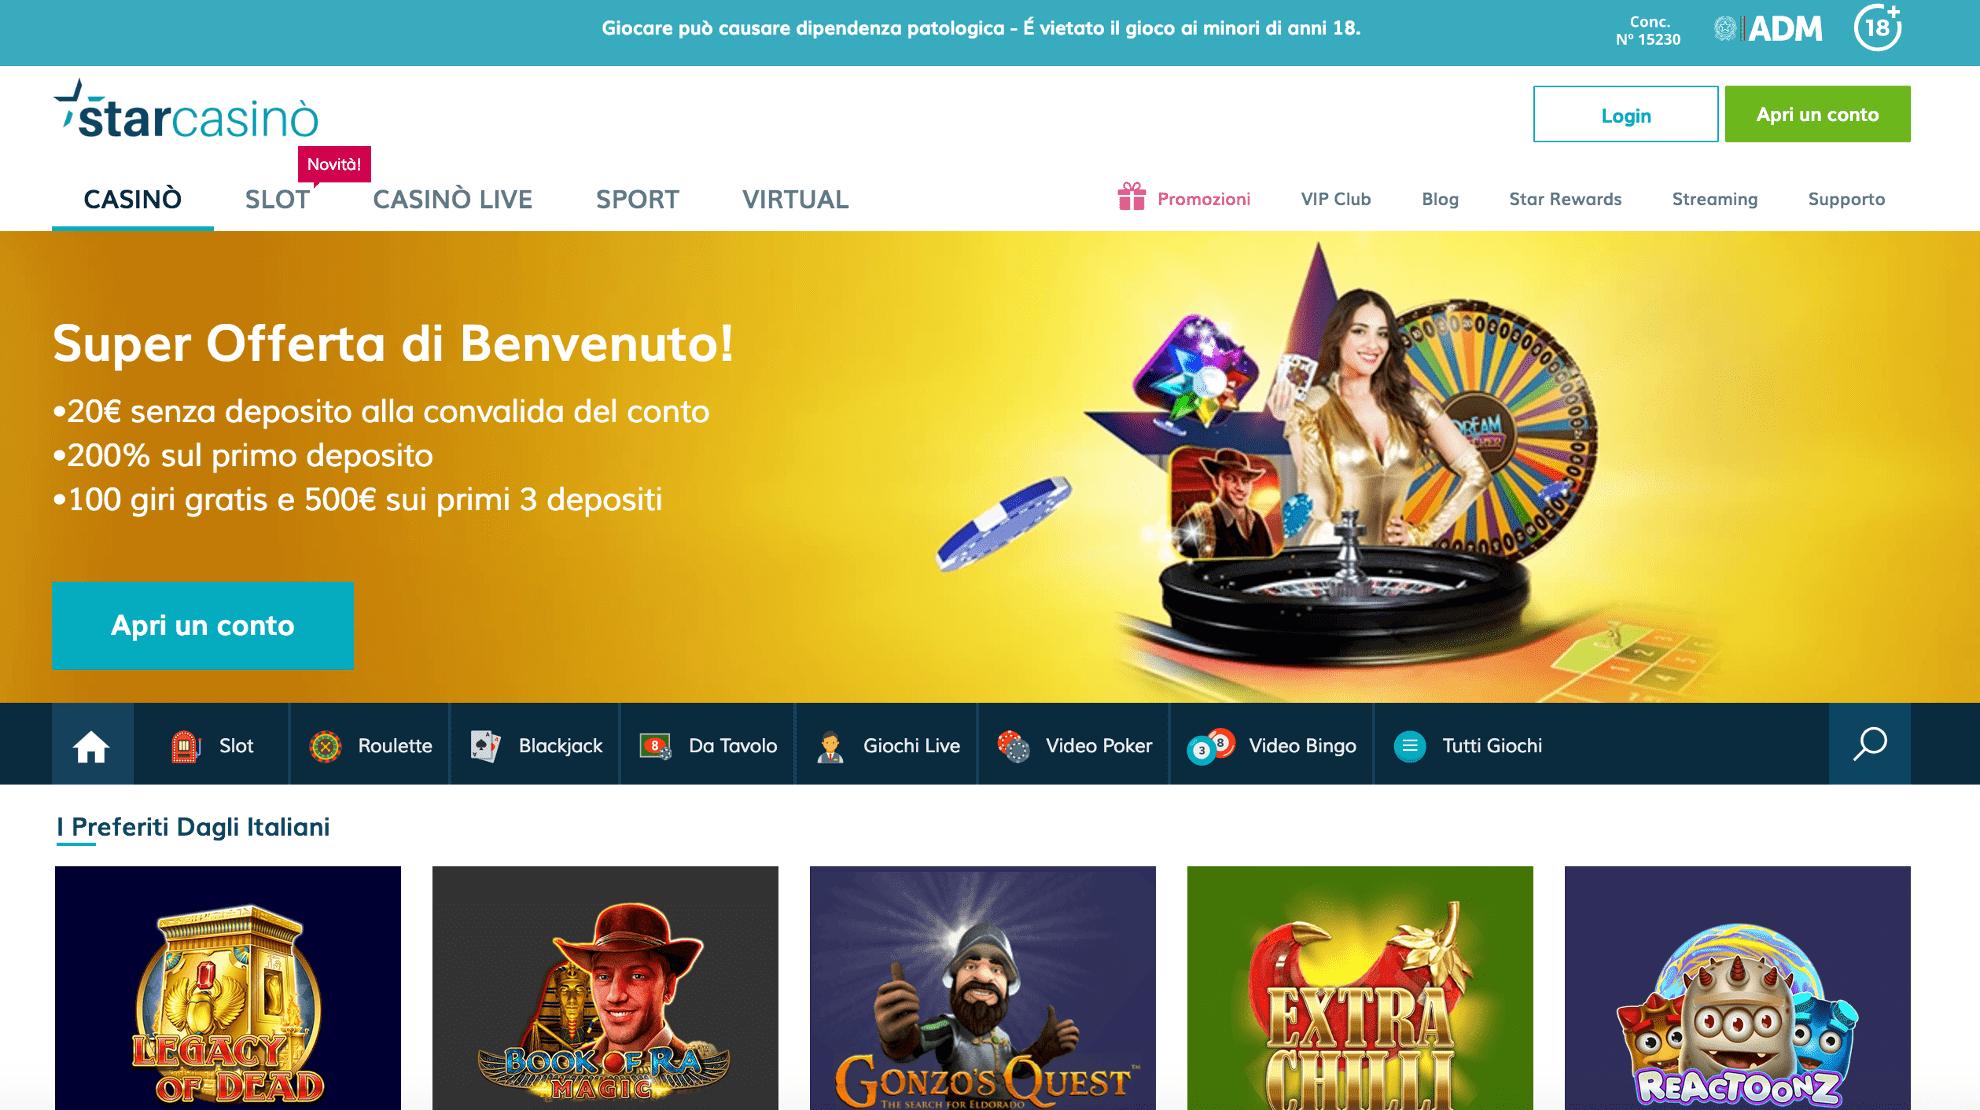 Starcasino miglior casino online AAMS